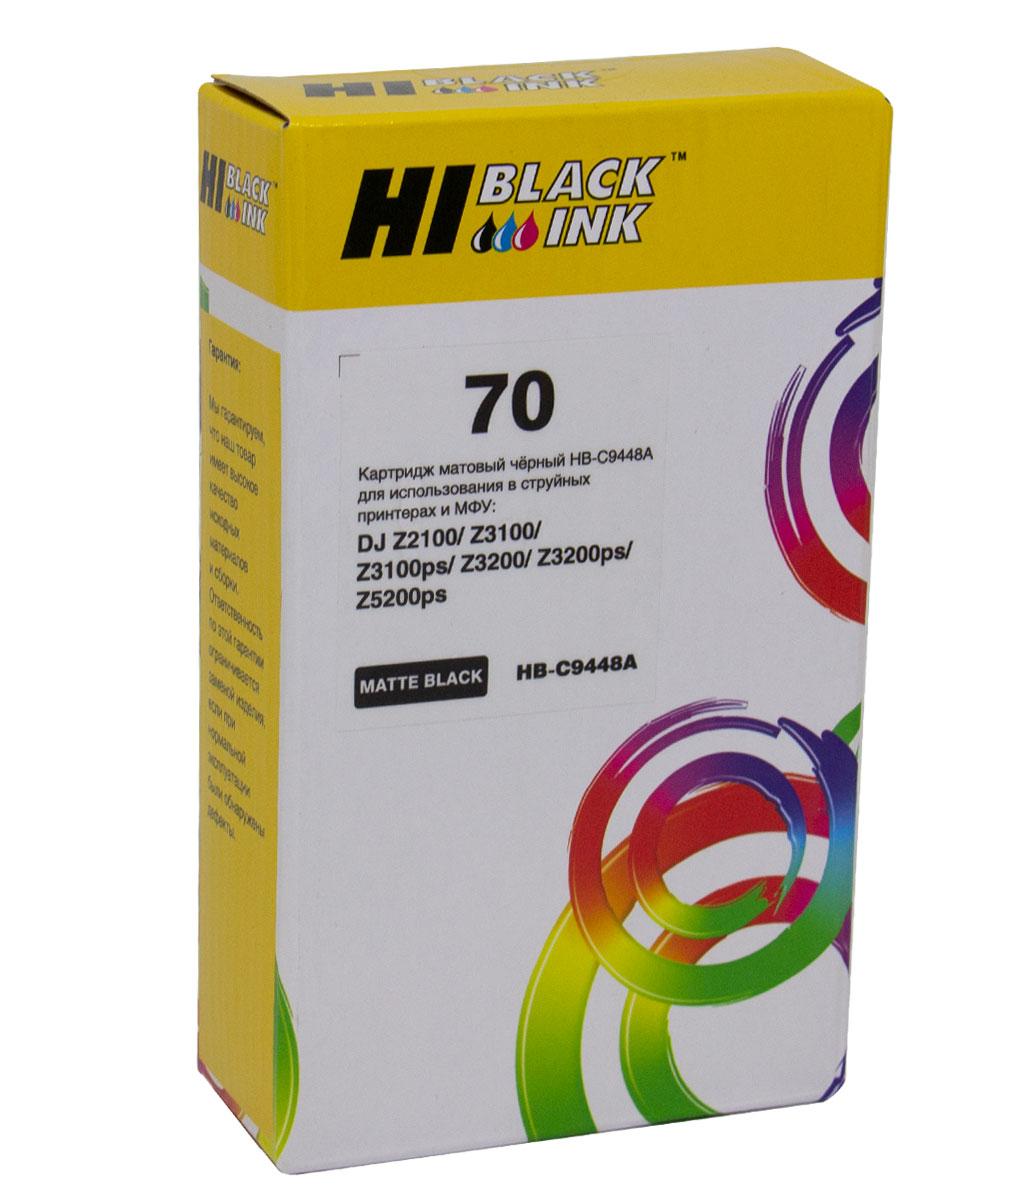 Картридж Hi-Black (HB-C9448A) №70 для HP DesignJet z2100/3100/3200/5200, MBk